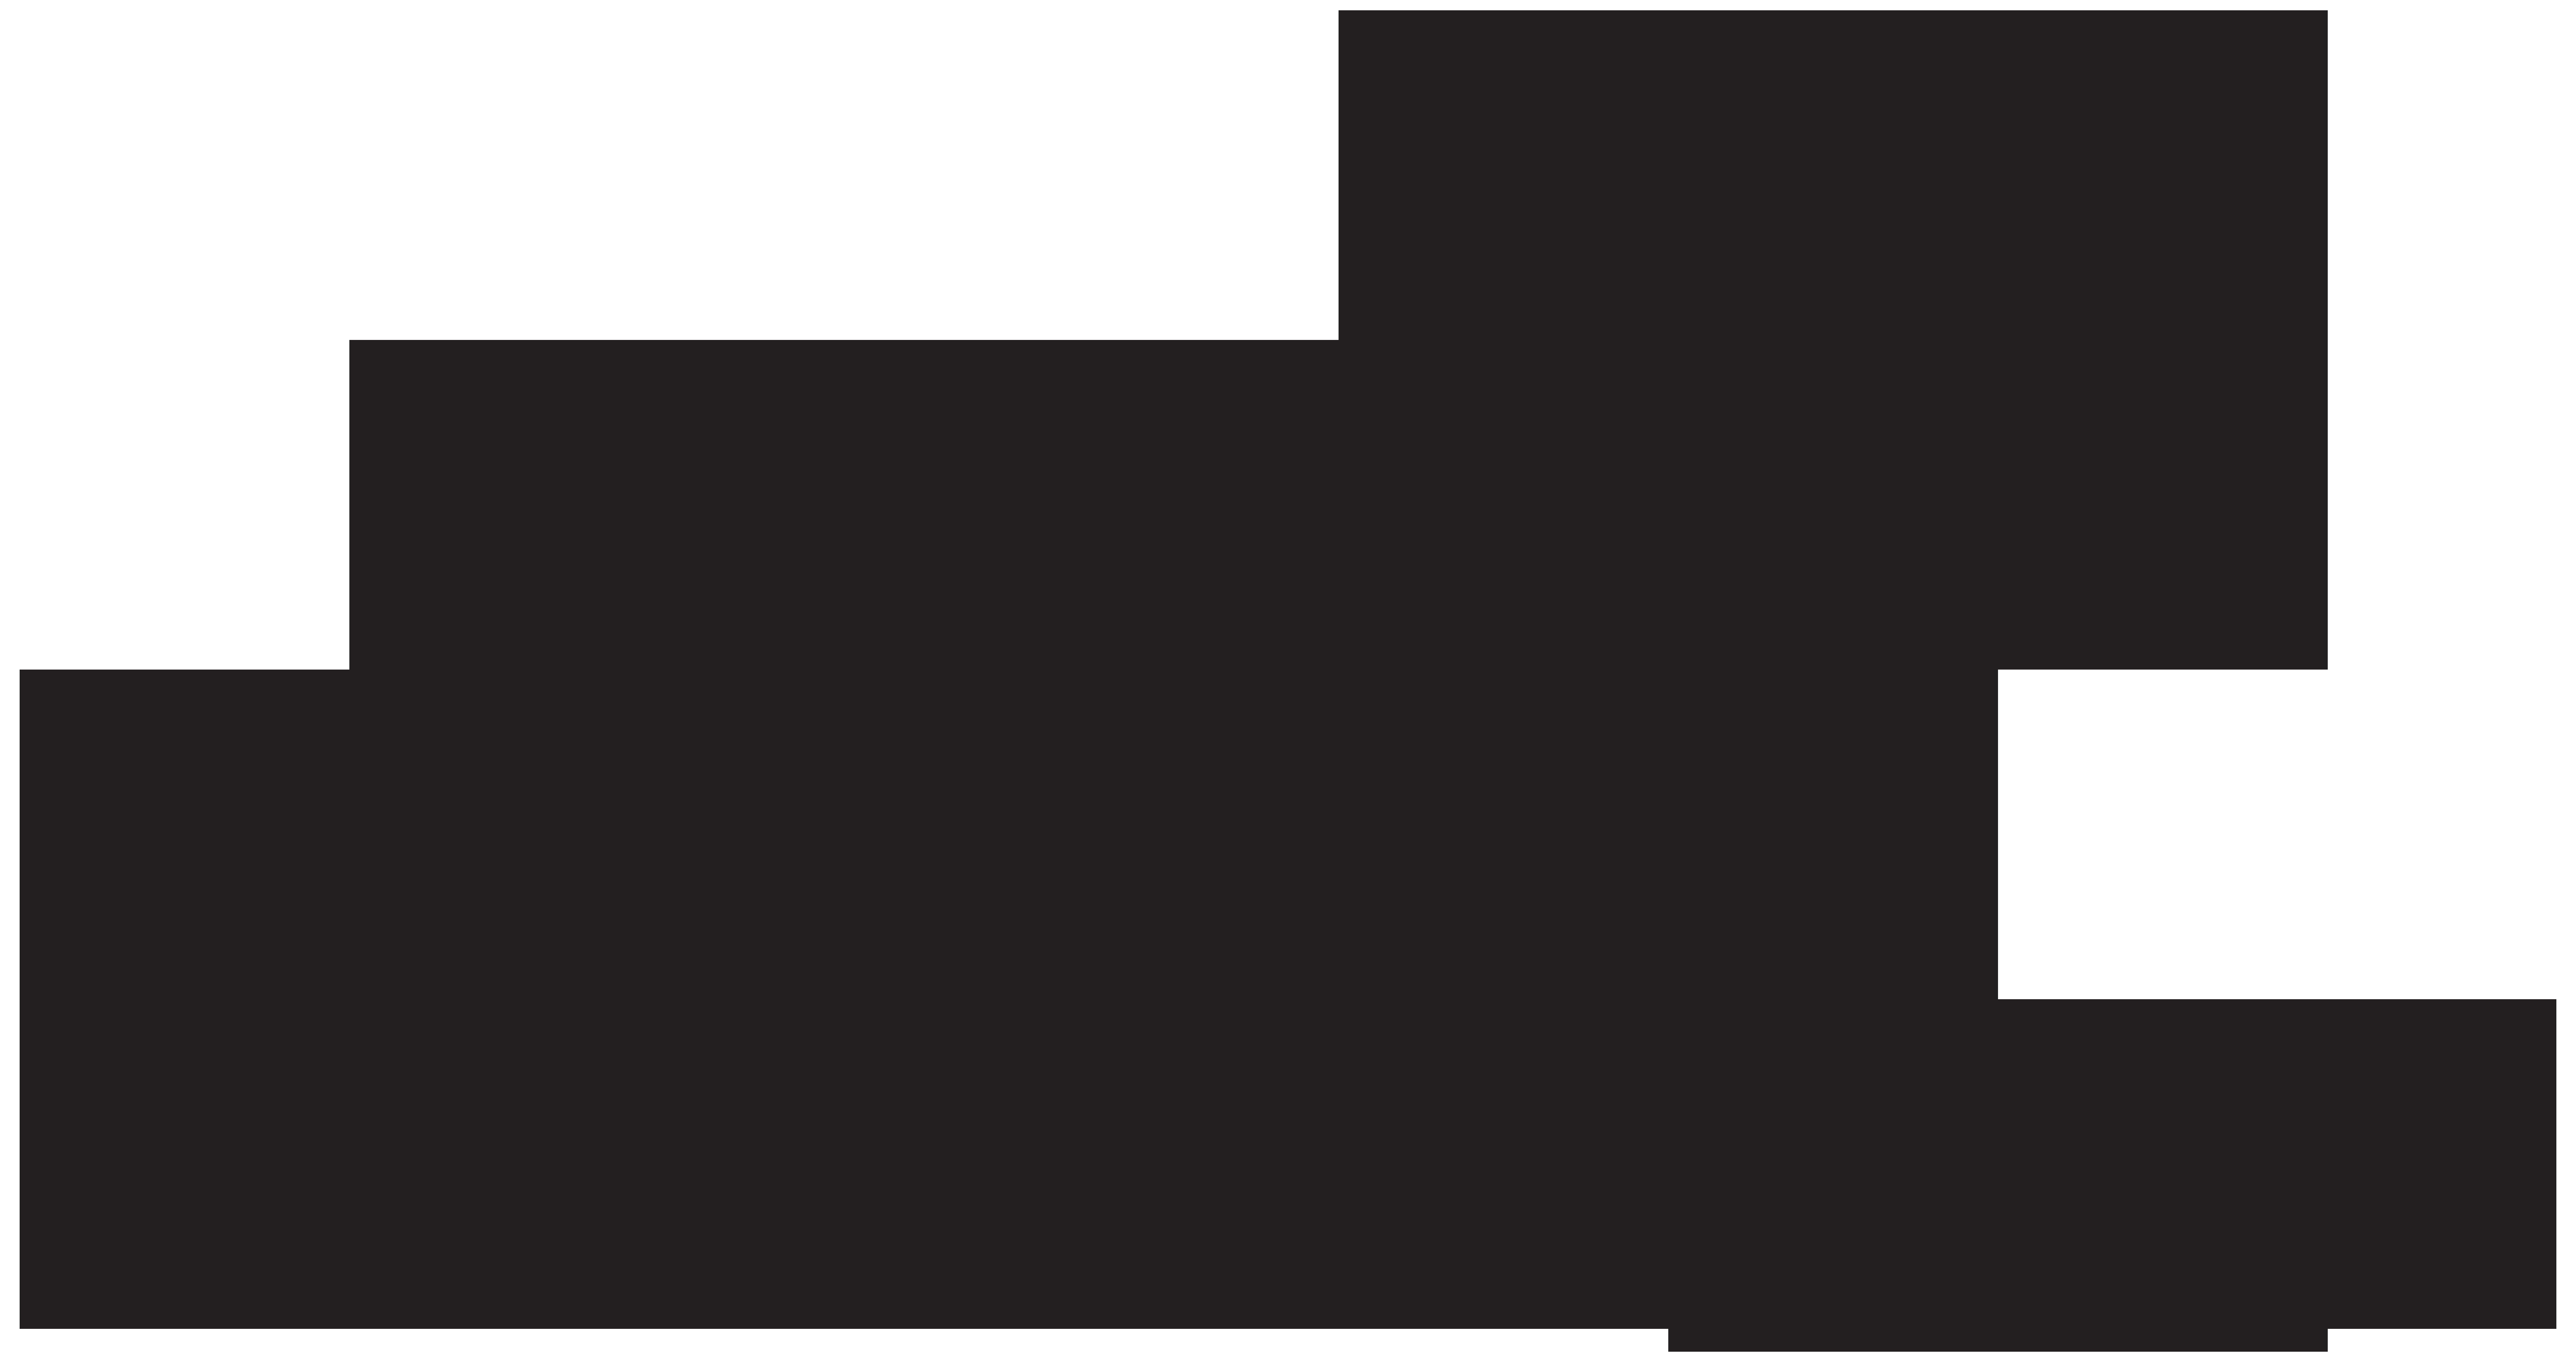 Tree clipart scene. Nativity silhouette png clip